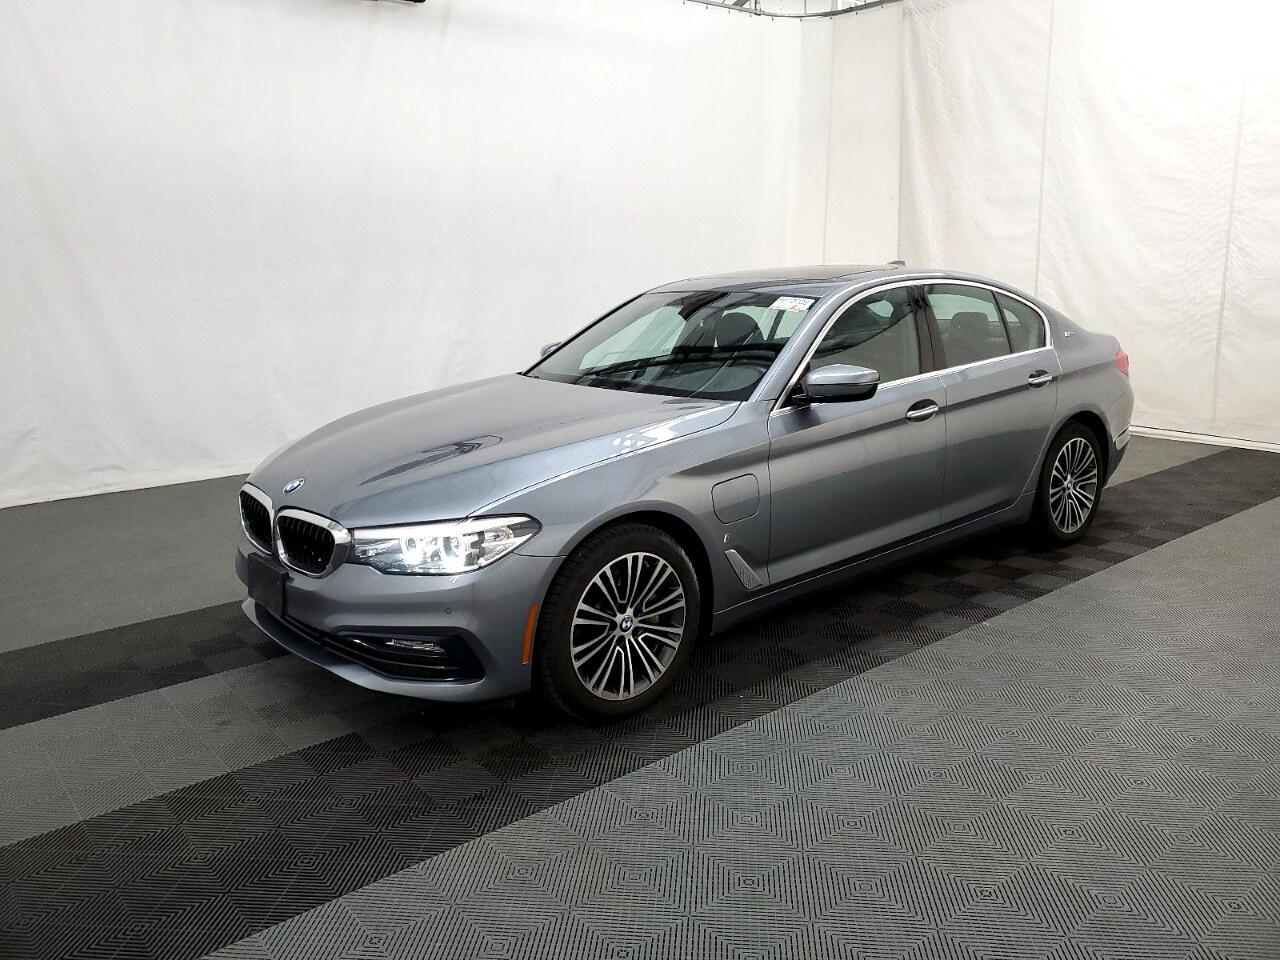 BMW 5 Series 530e xDrive iPerformance Plug-In Hybrid 2018